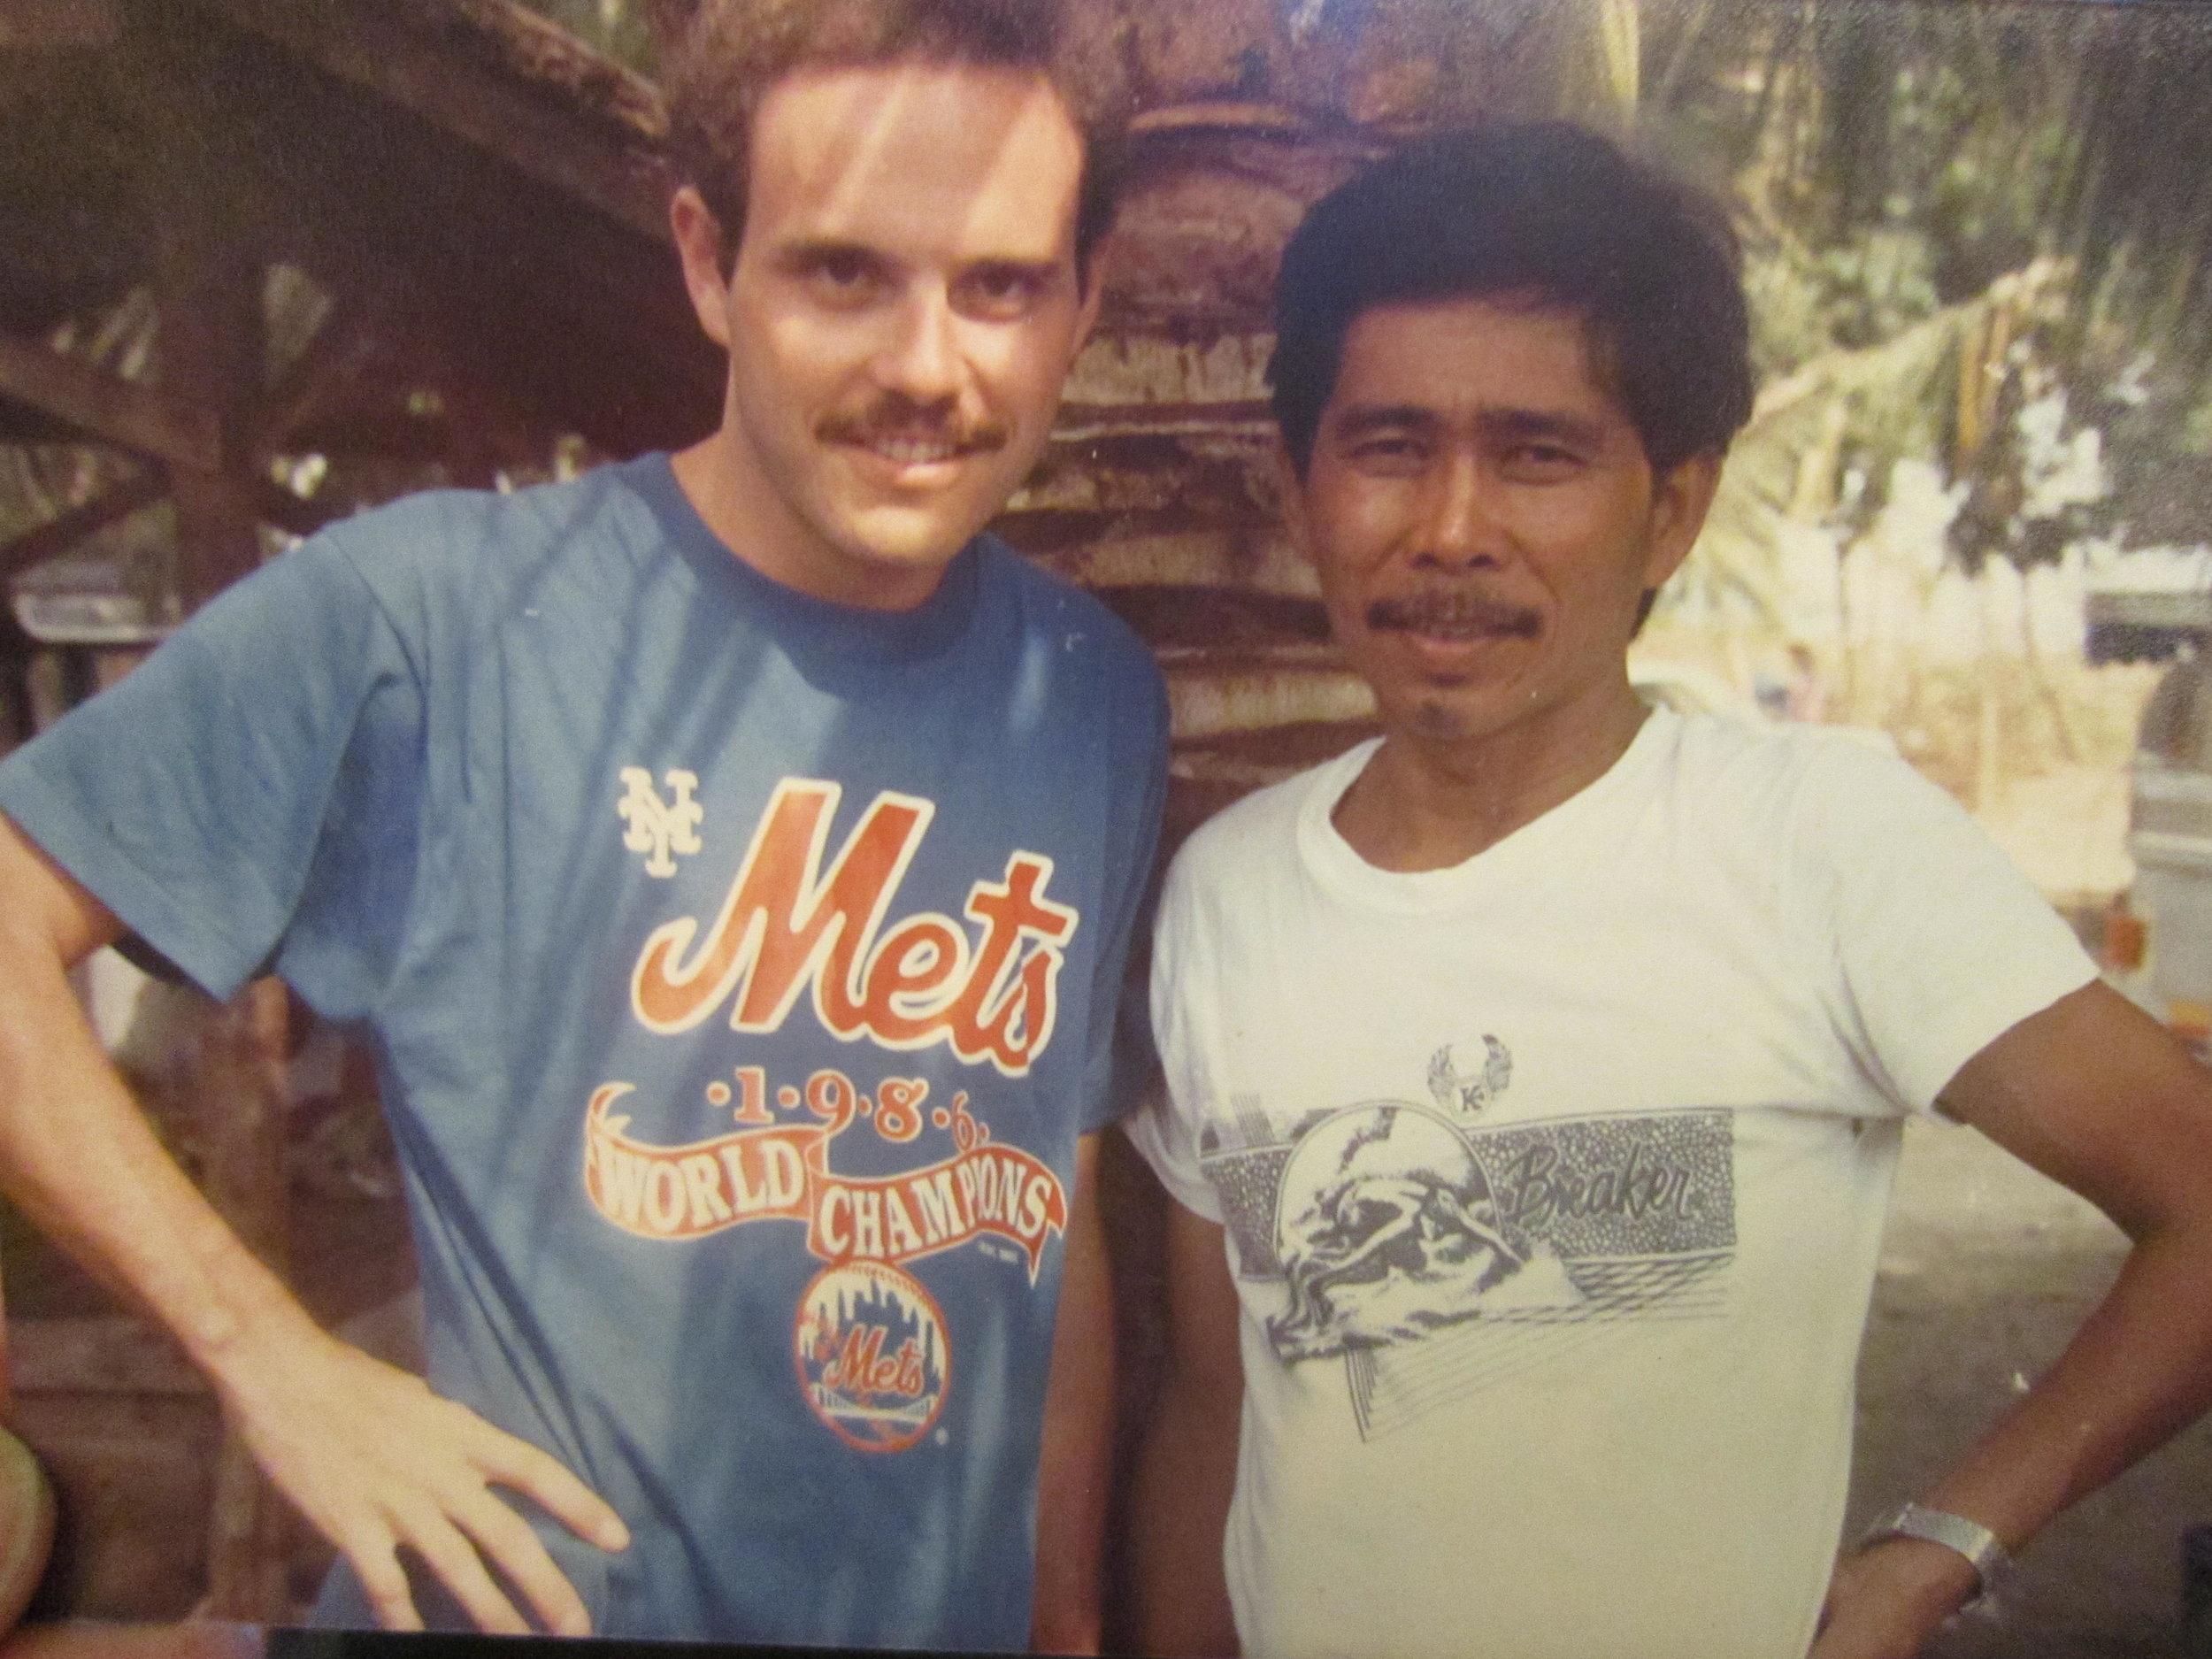 With Emet, 1987